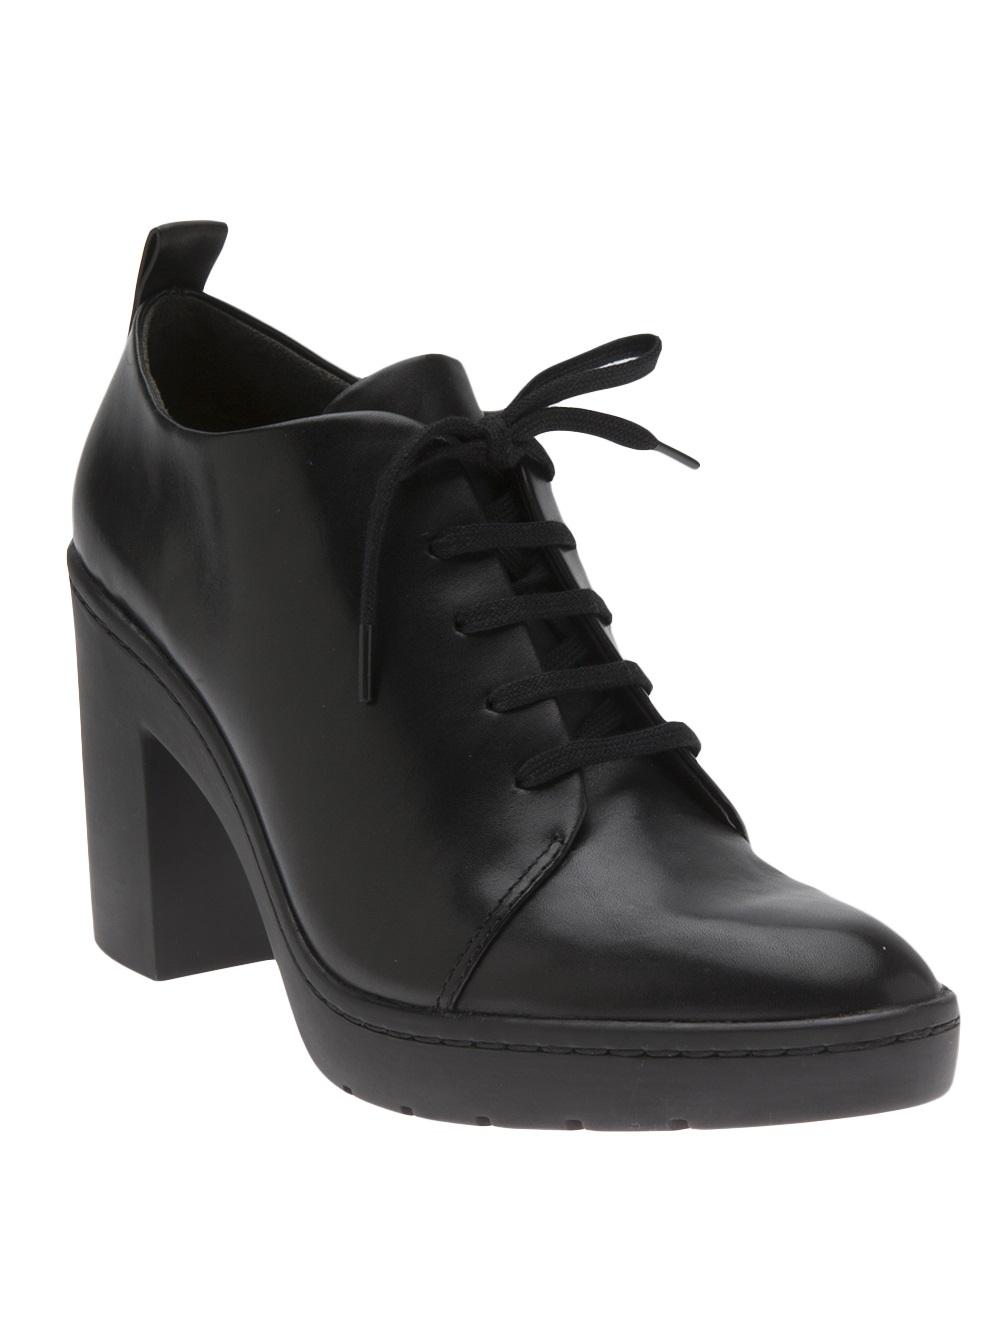 67f79a500d4 Lyst - Alexander Wang Pointed Toe Dress Shoe in Black